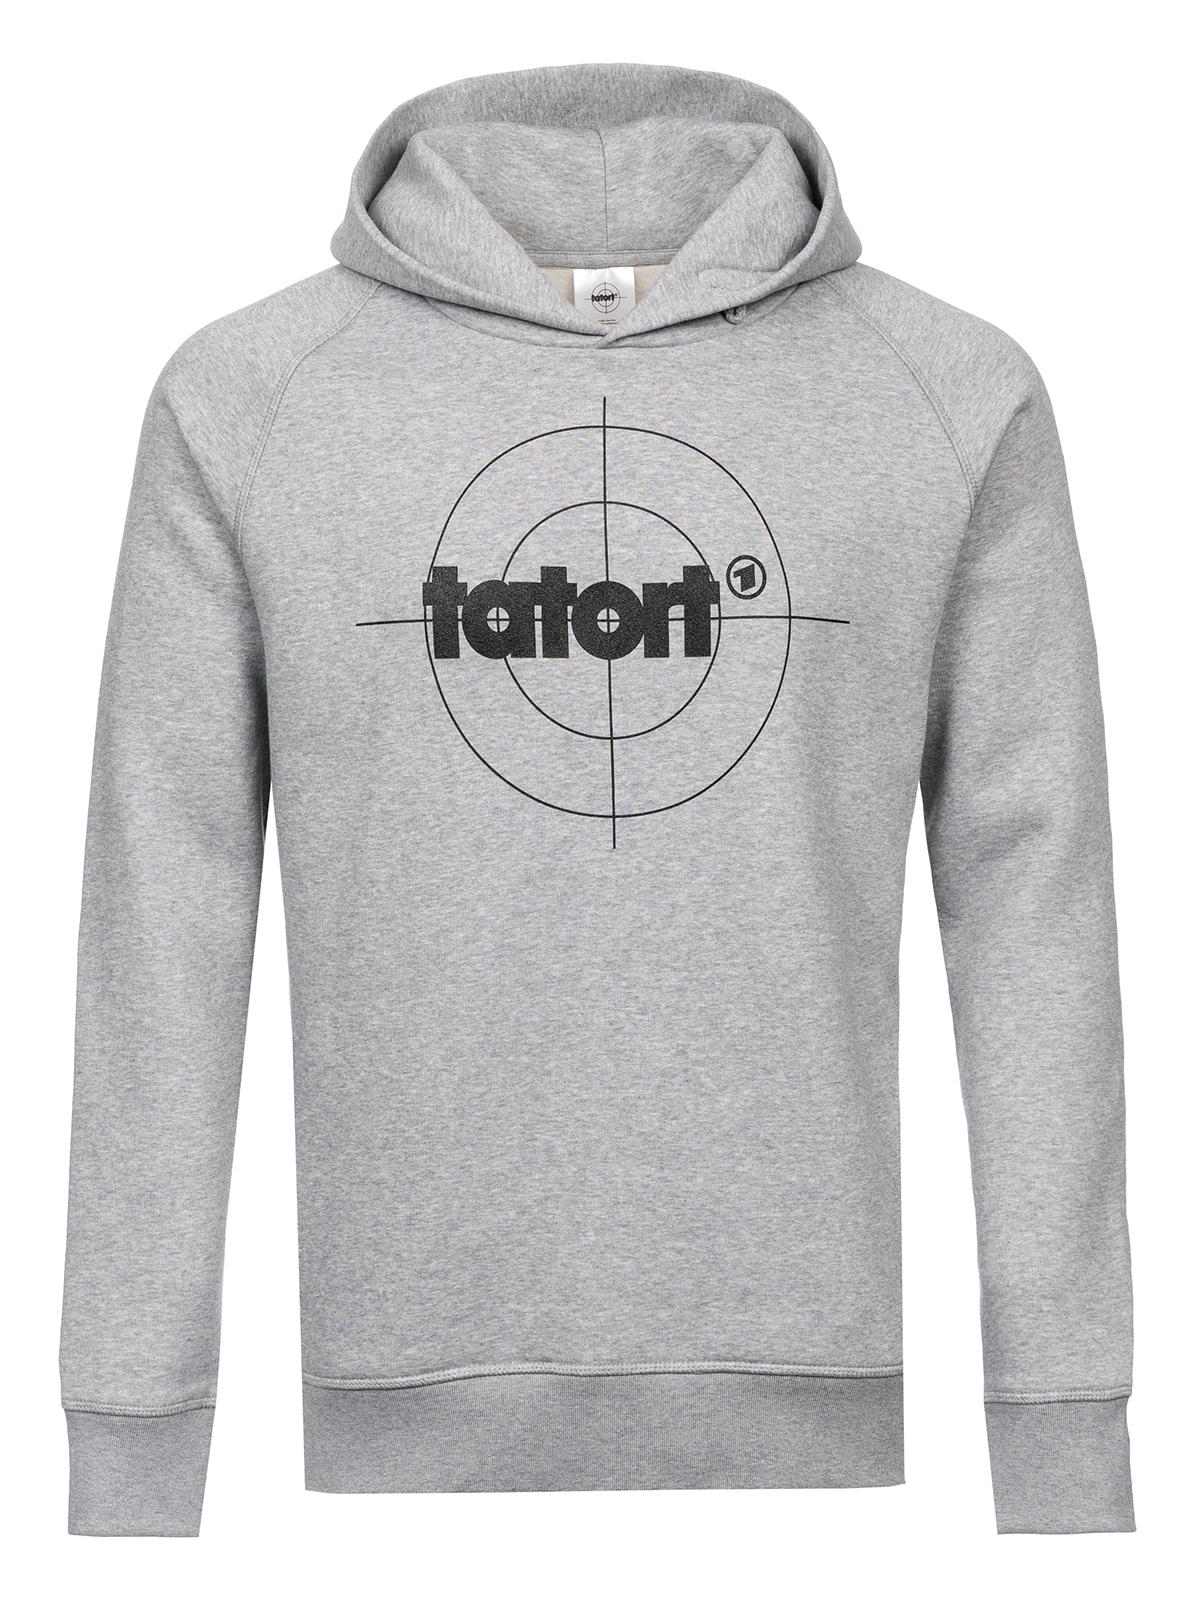 7185e66dccf Tatort Classic Hooded Sweater grey-melange Men sweater   hoodies